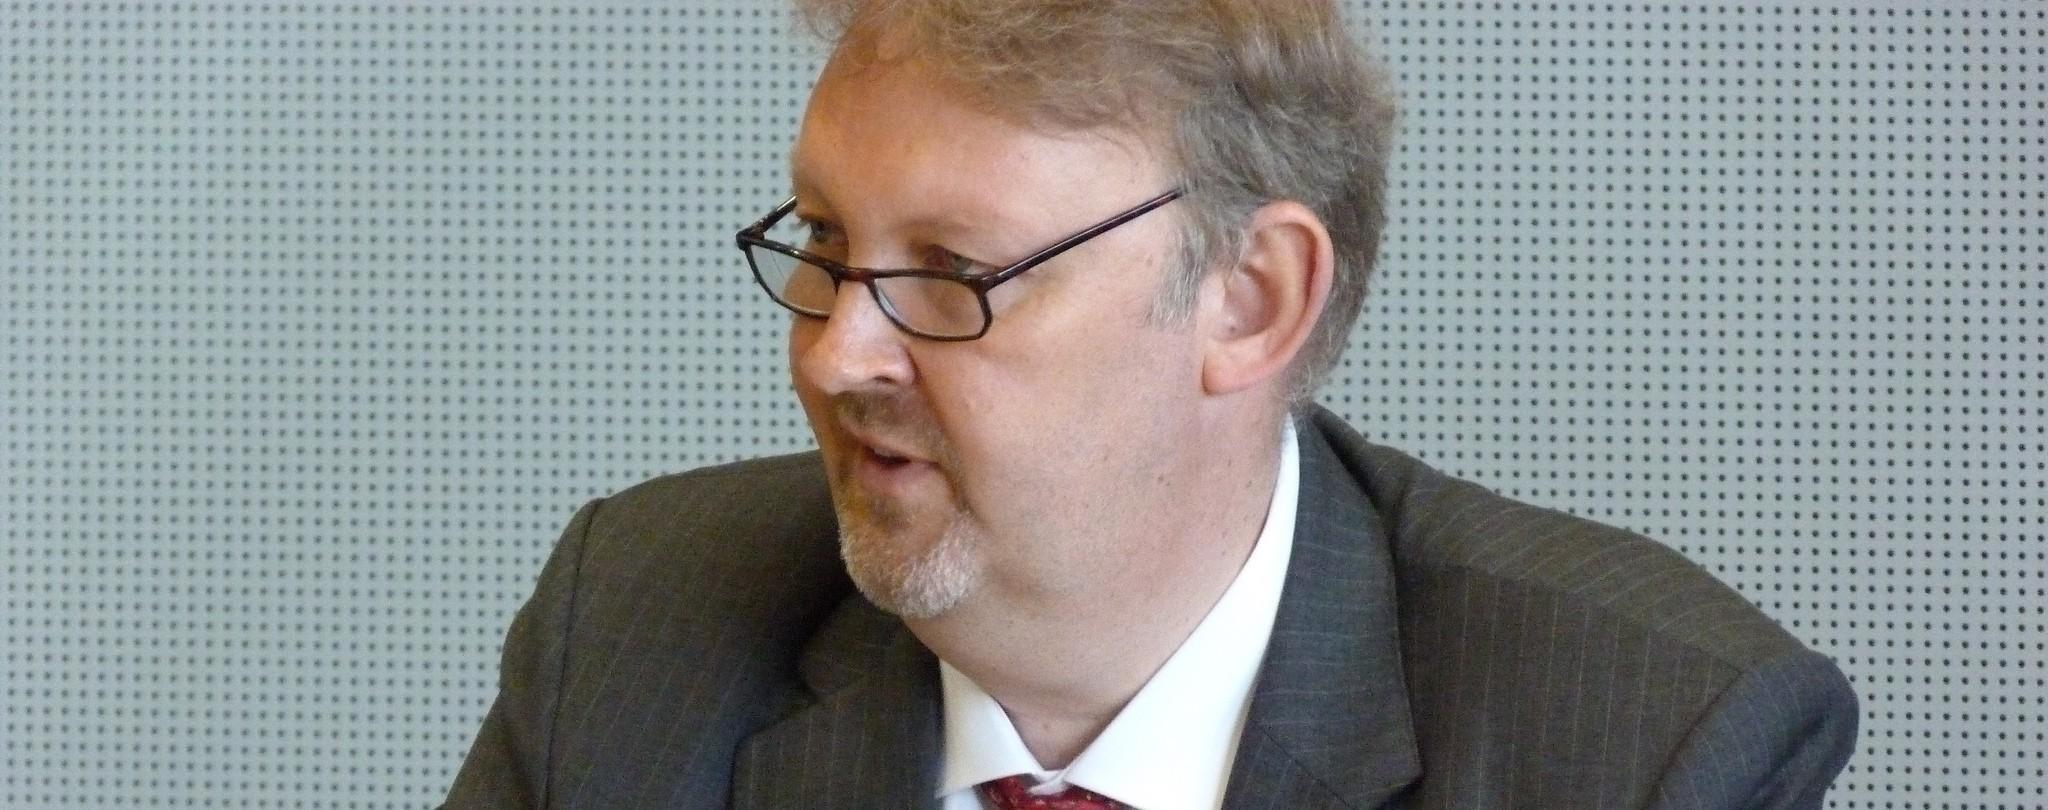 Dirk Carrez